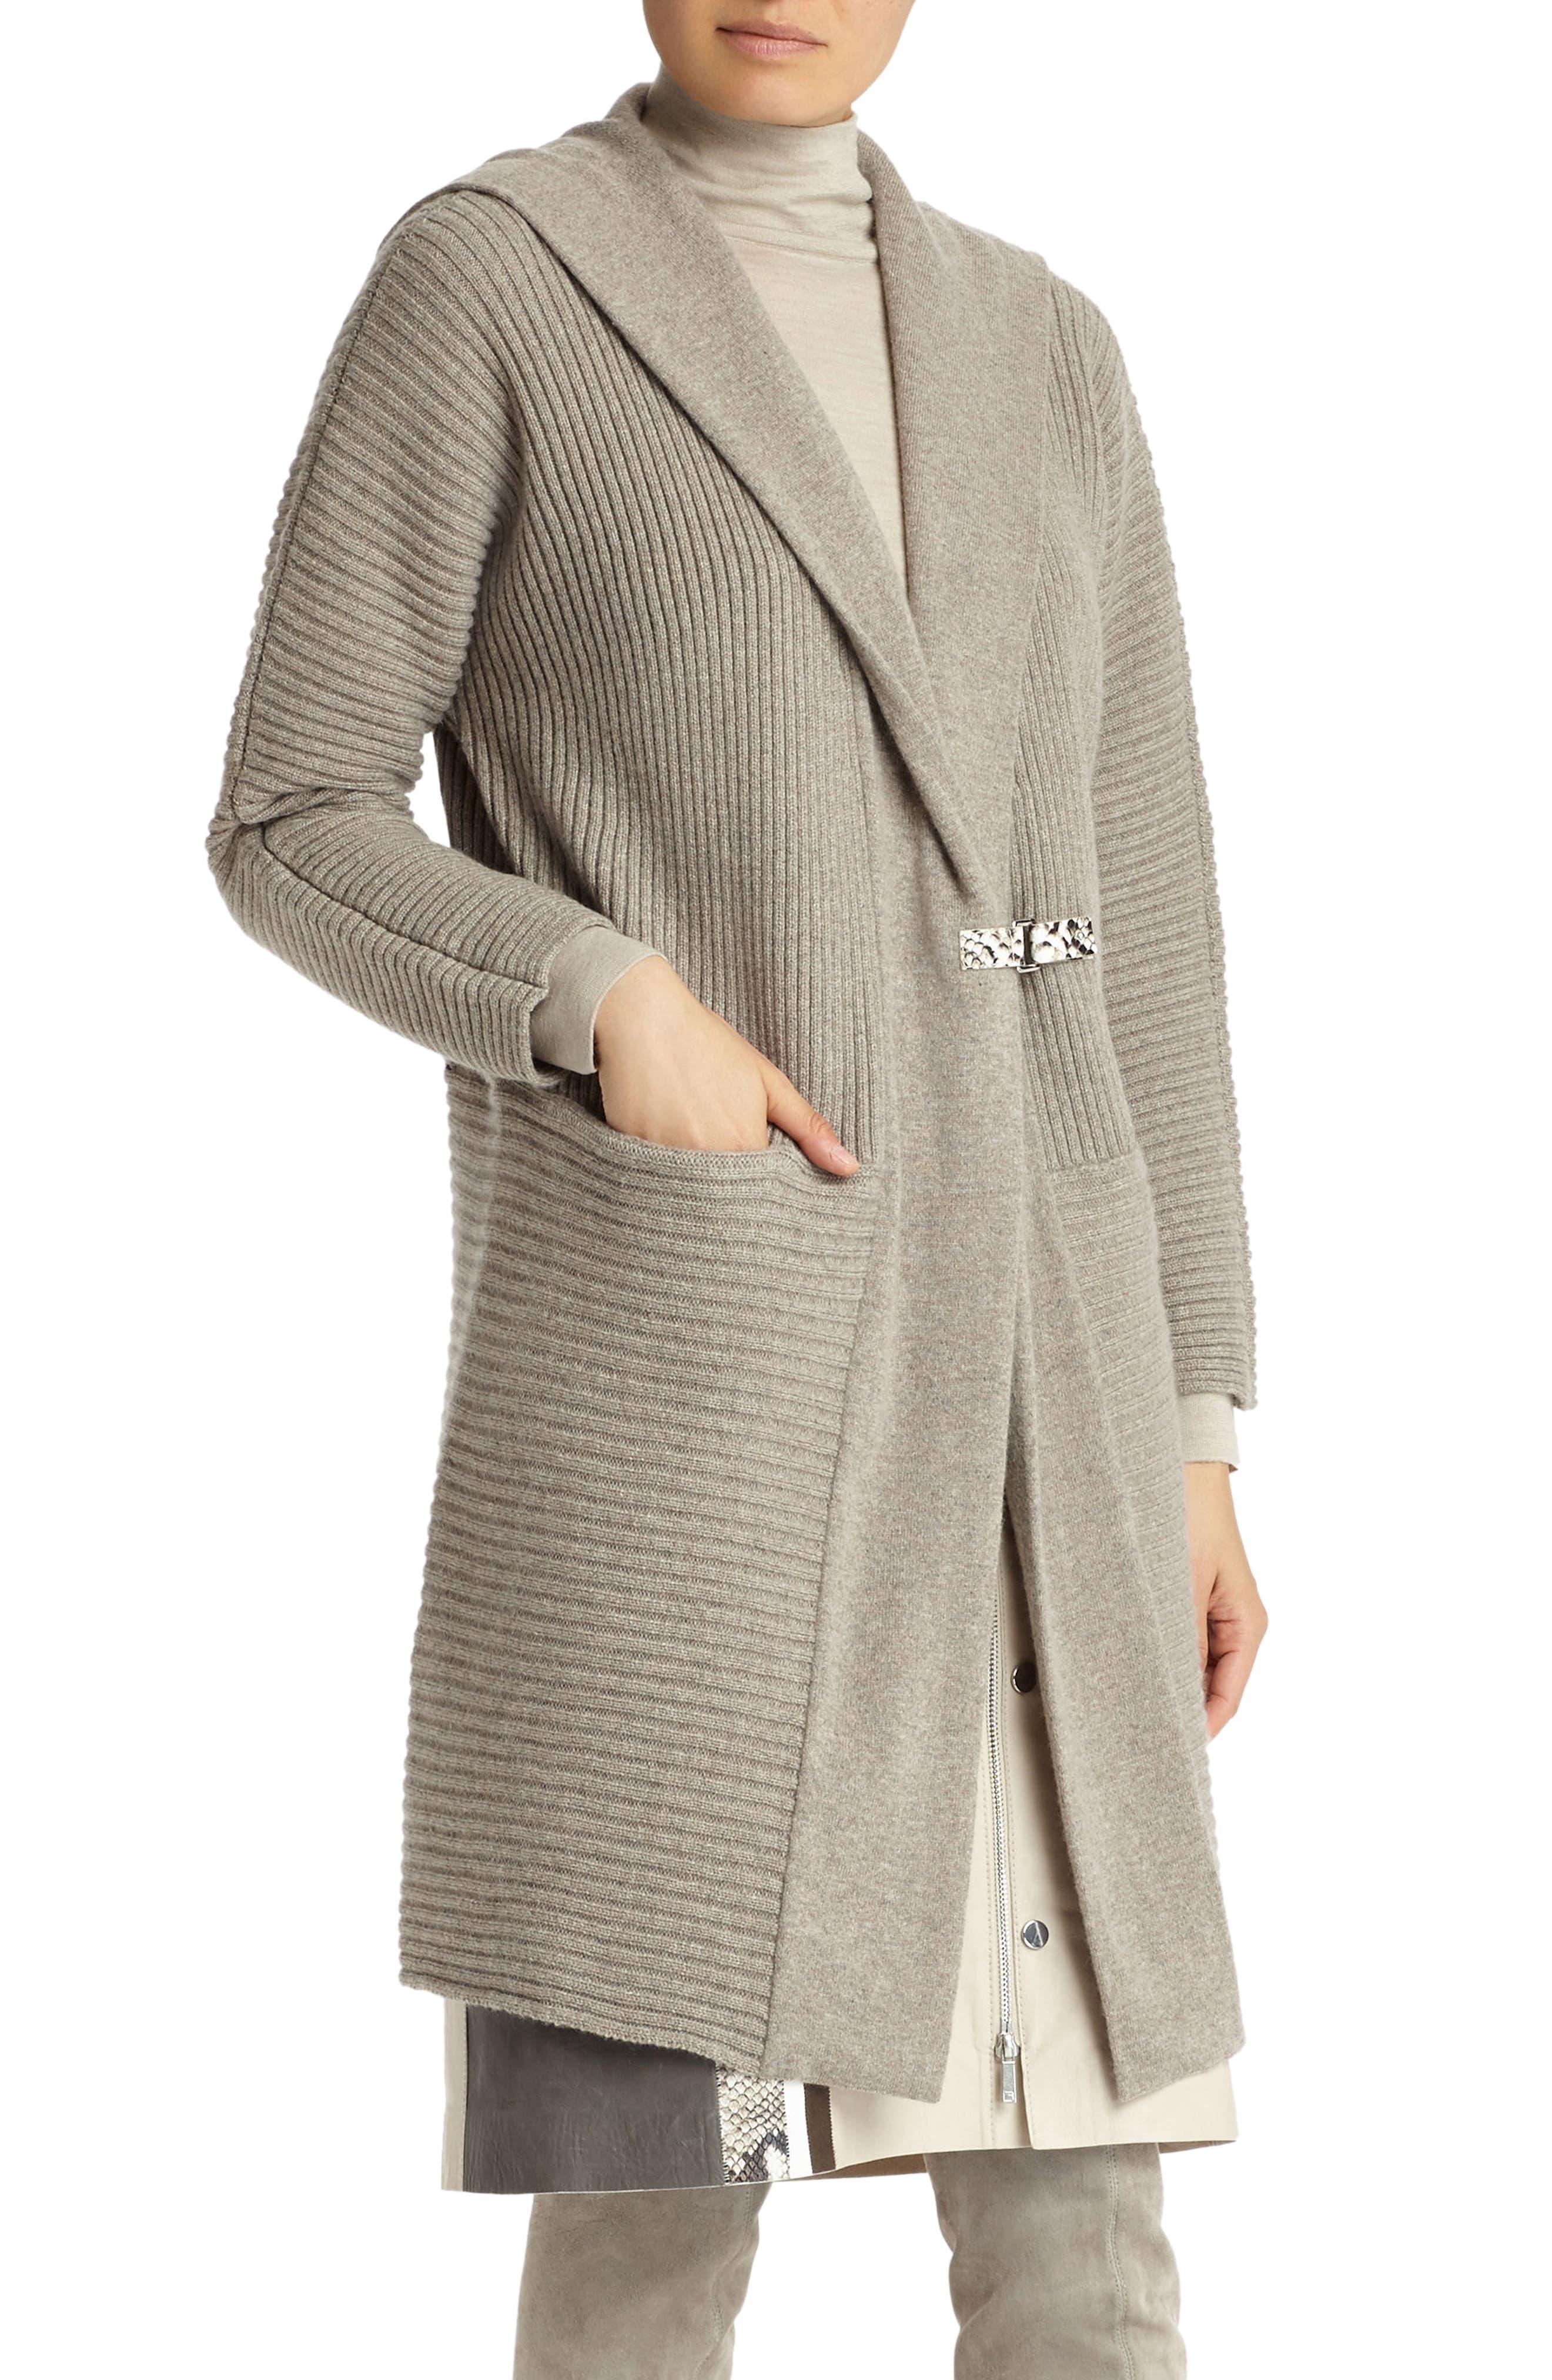 Main Image - Lafayette 148 New York Mixed Rib Cashmere Hooded Cardigan